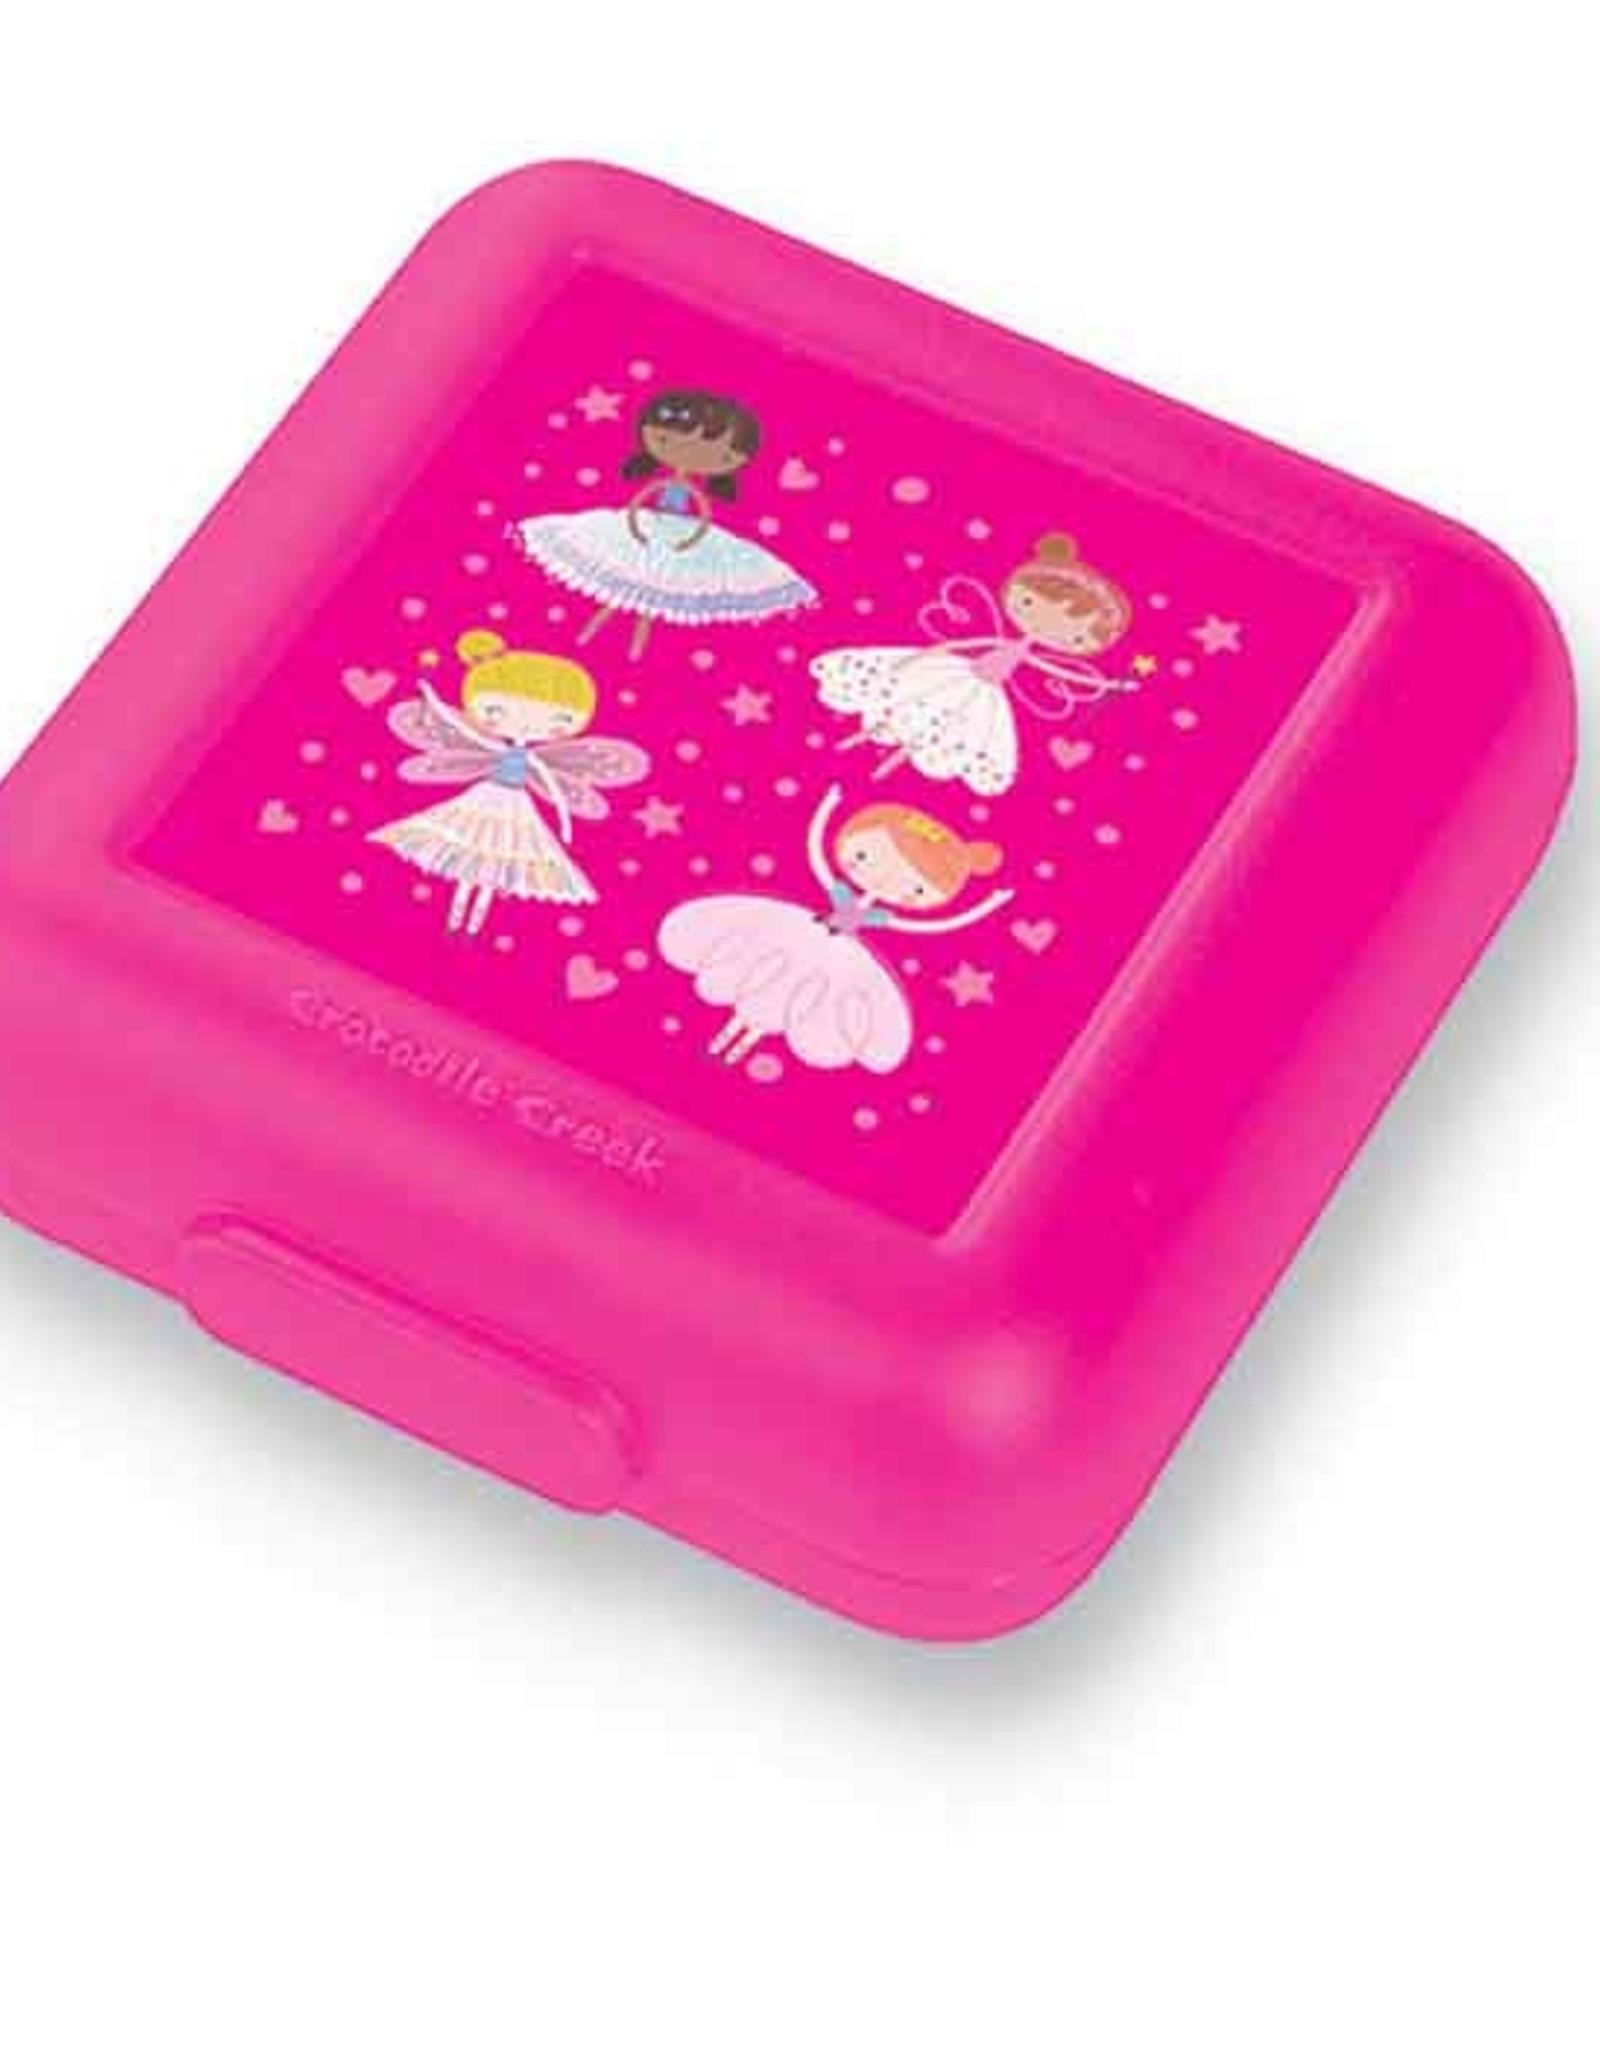 Crocodile Creek Lunchbox Pink Wonders